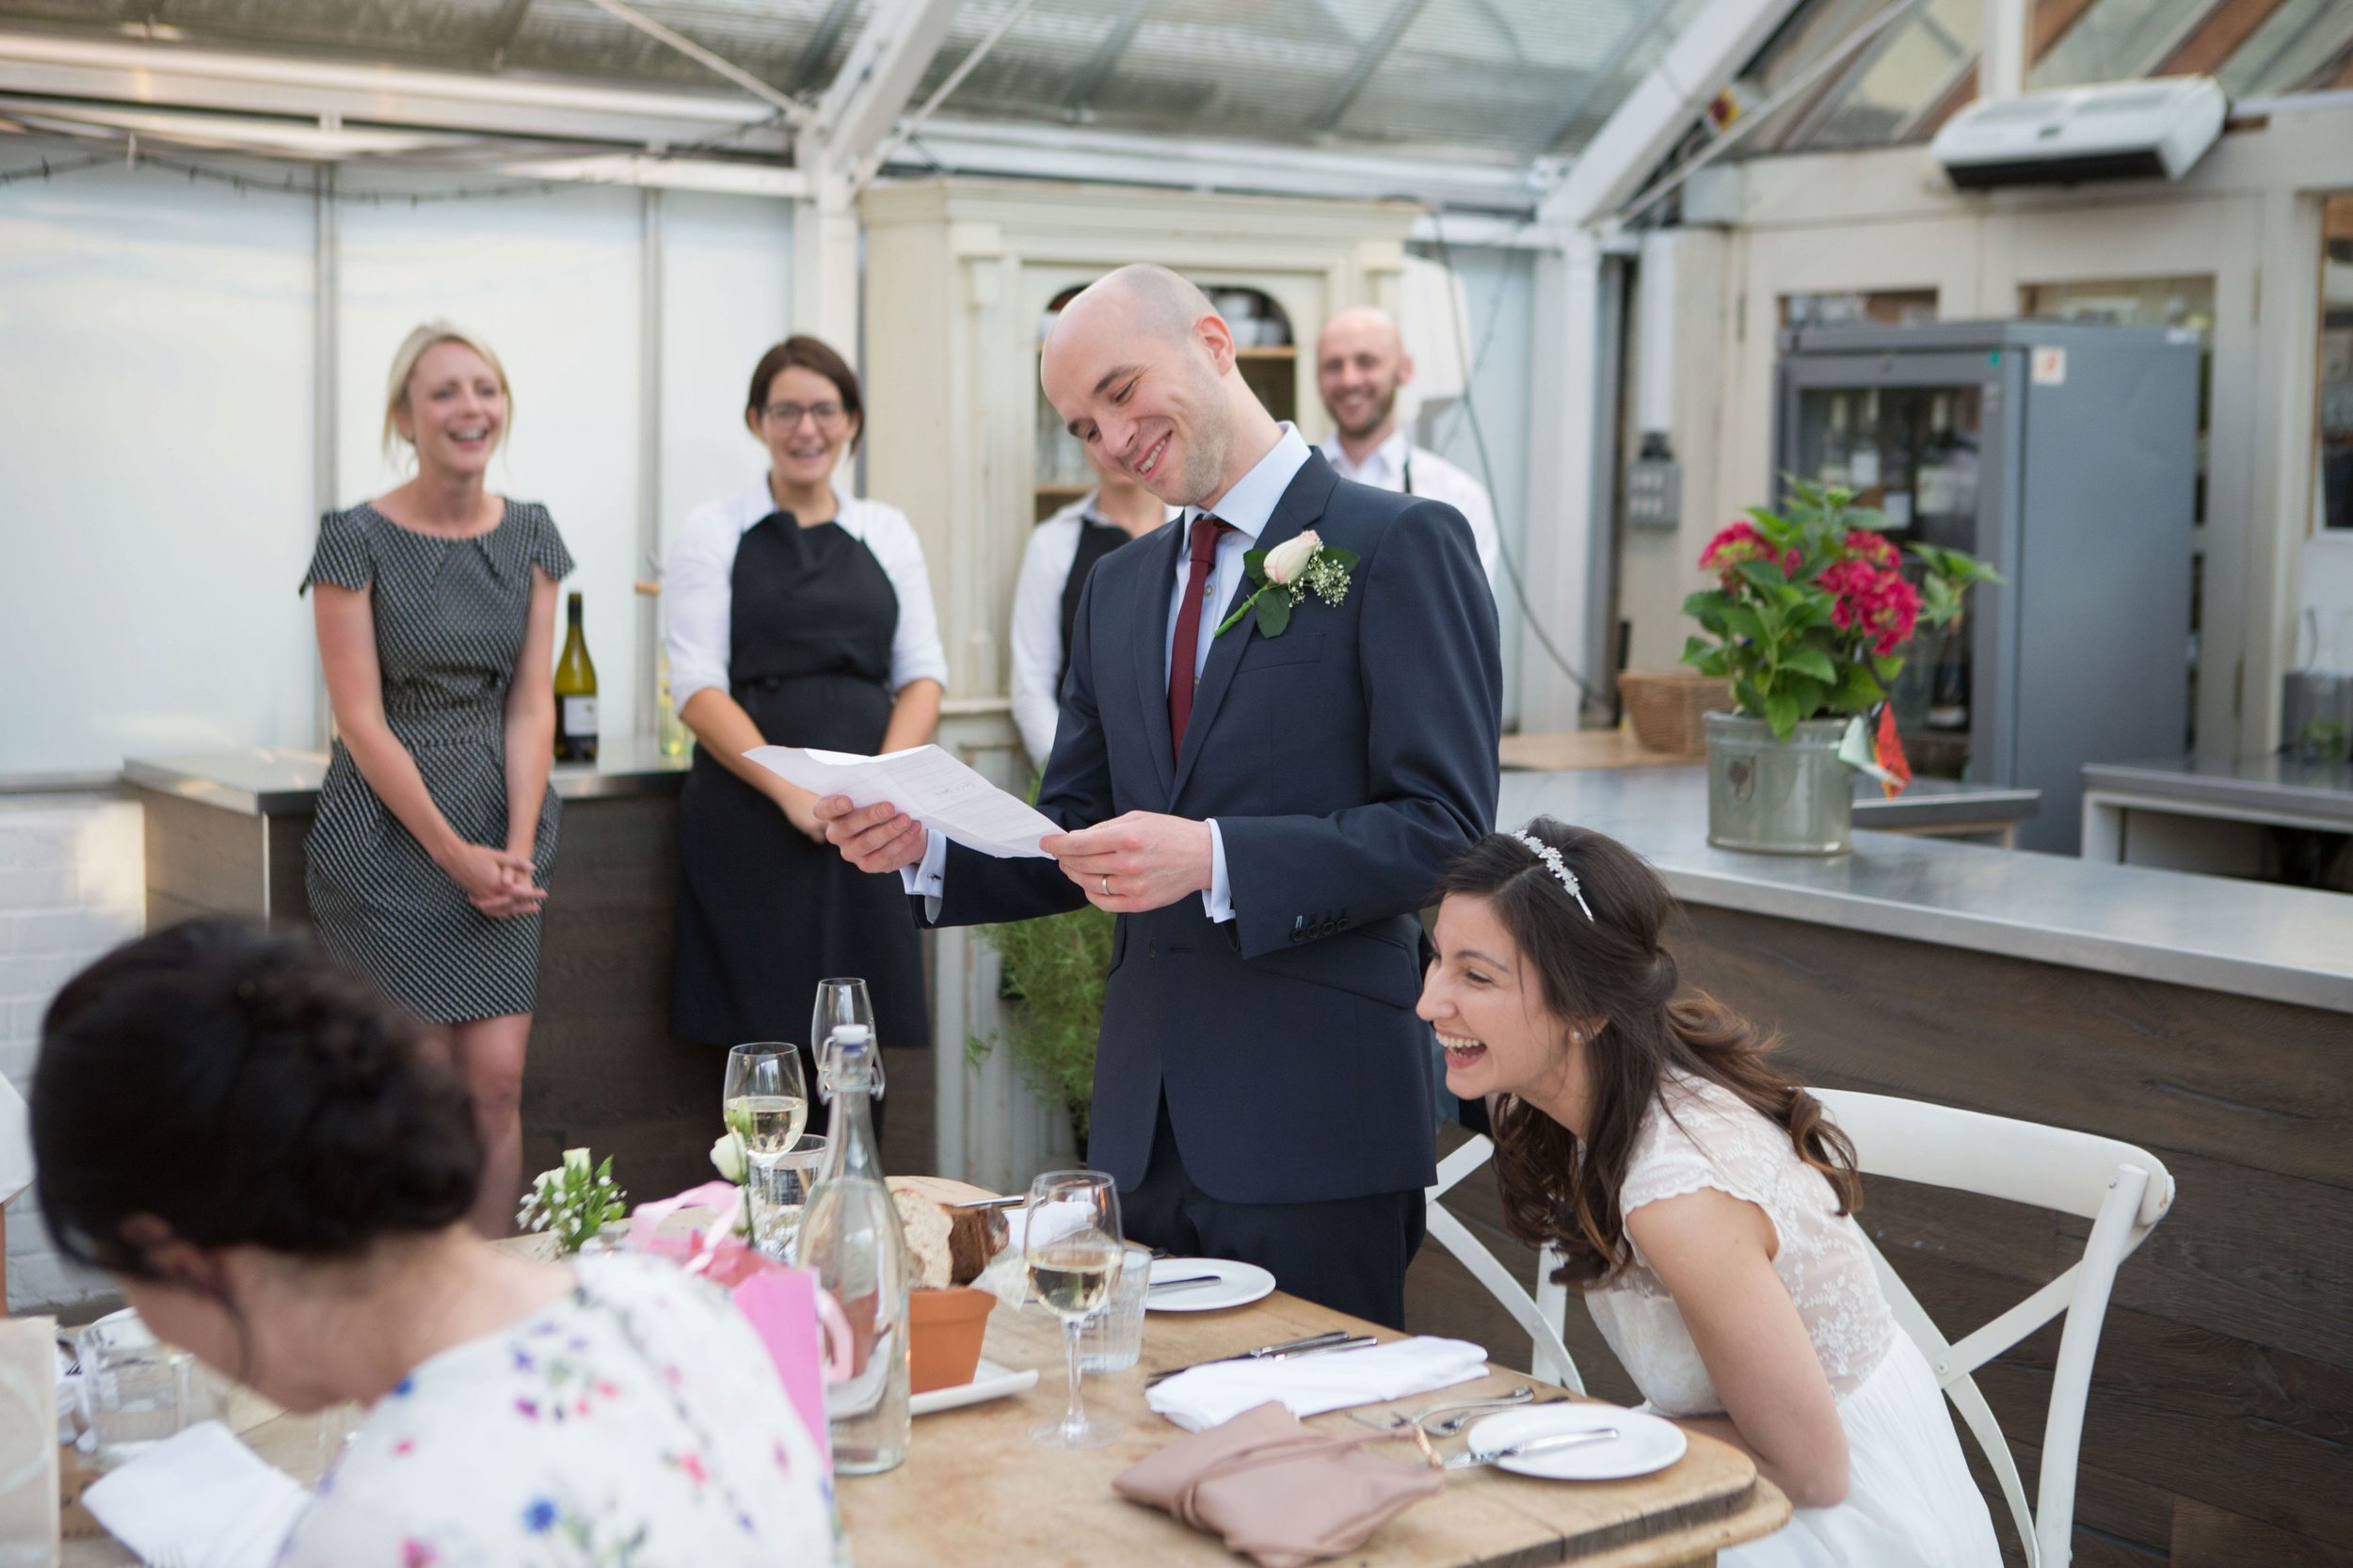 Hulya_&_Ben's_Clifton_Nurseries_London_Wedding_0930.jpg